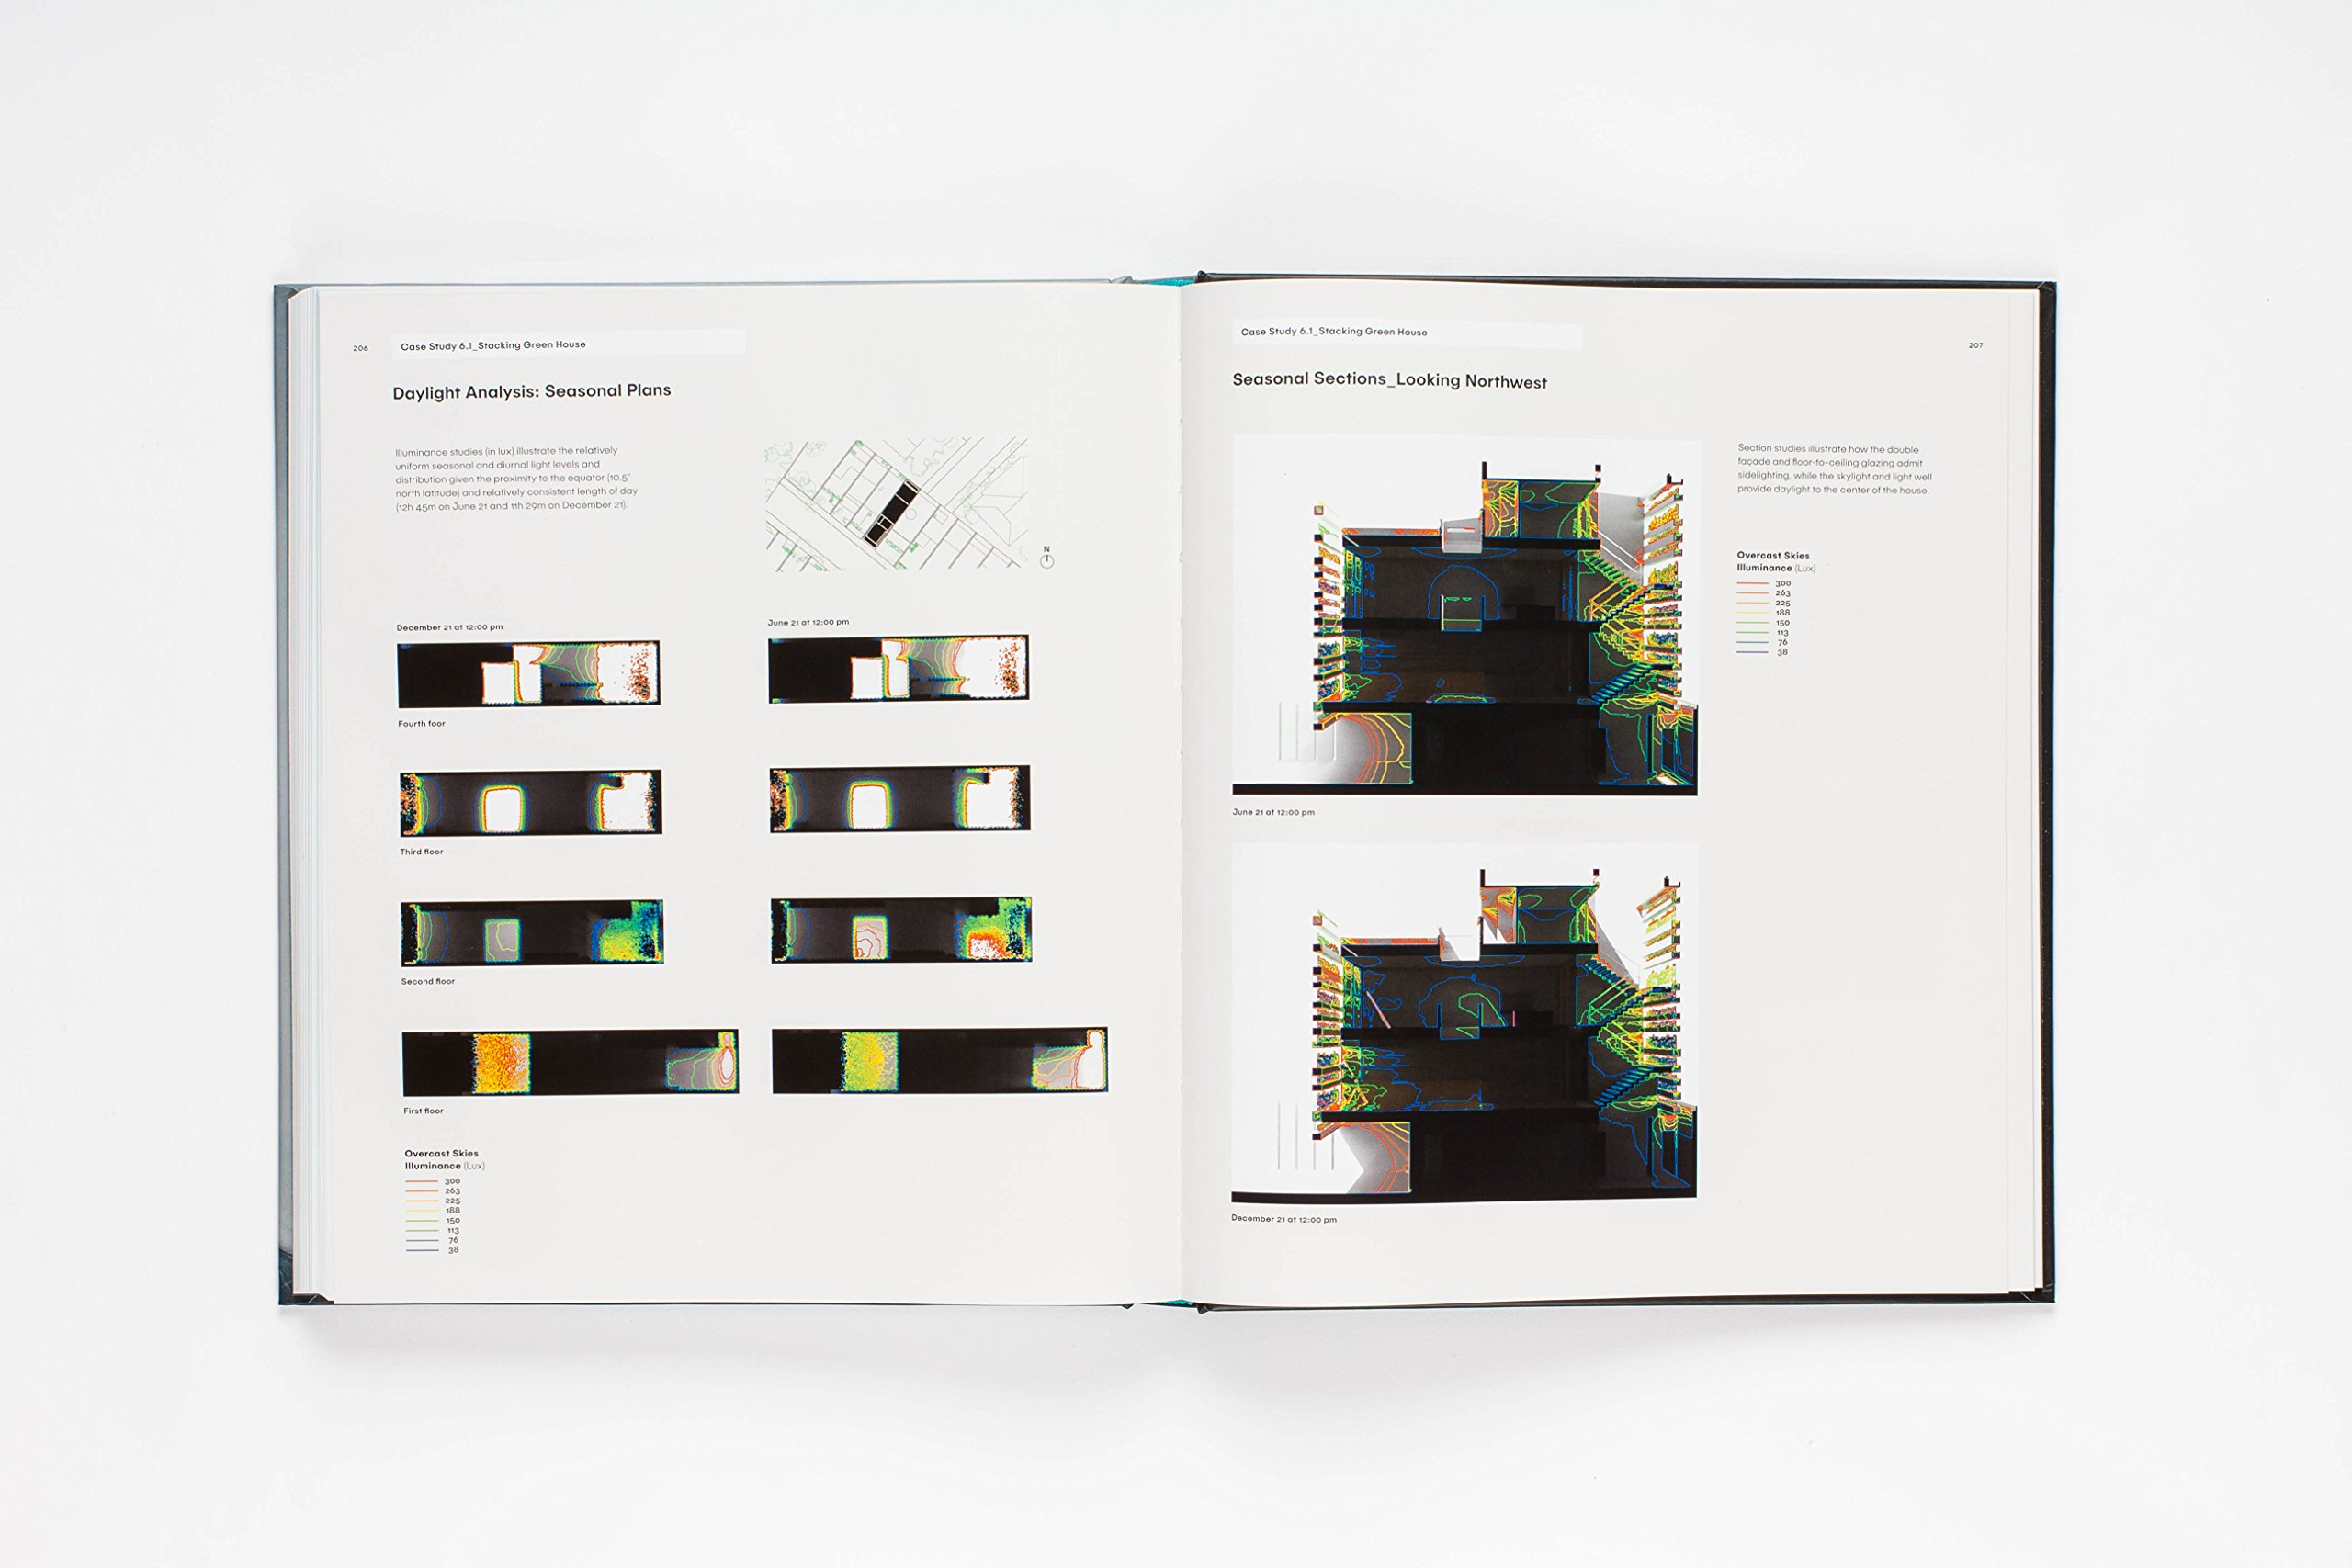 The Art of Architectural Daylighting: Mary Guzowski